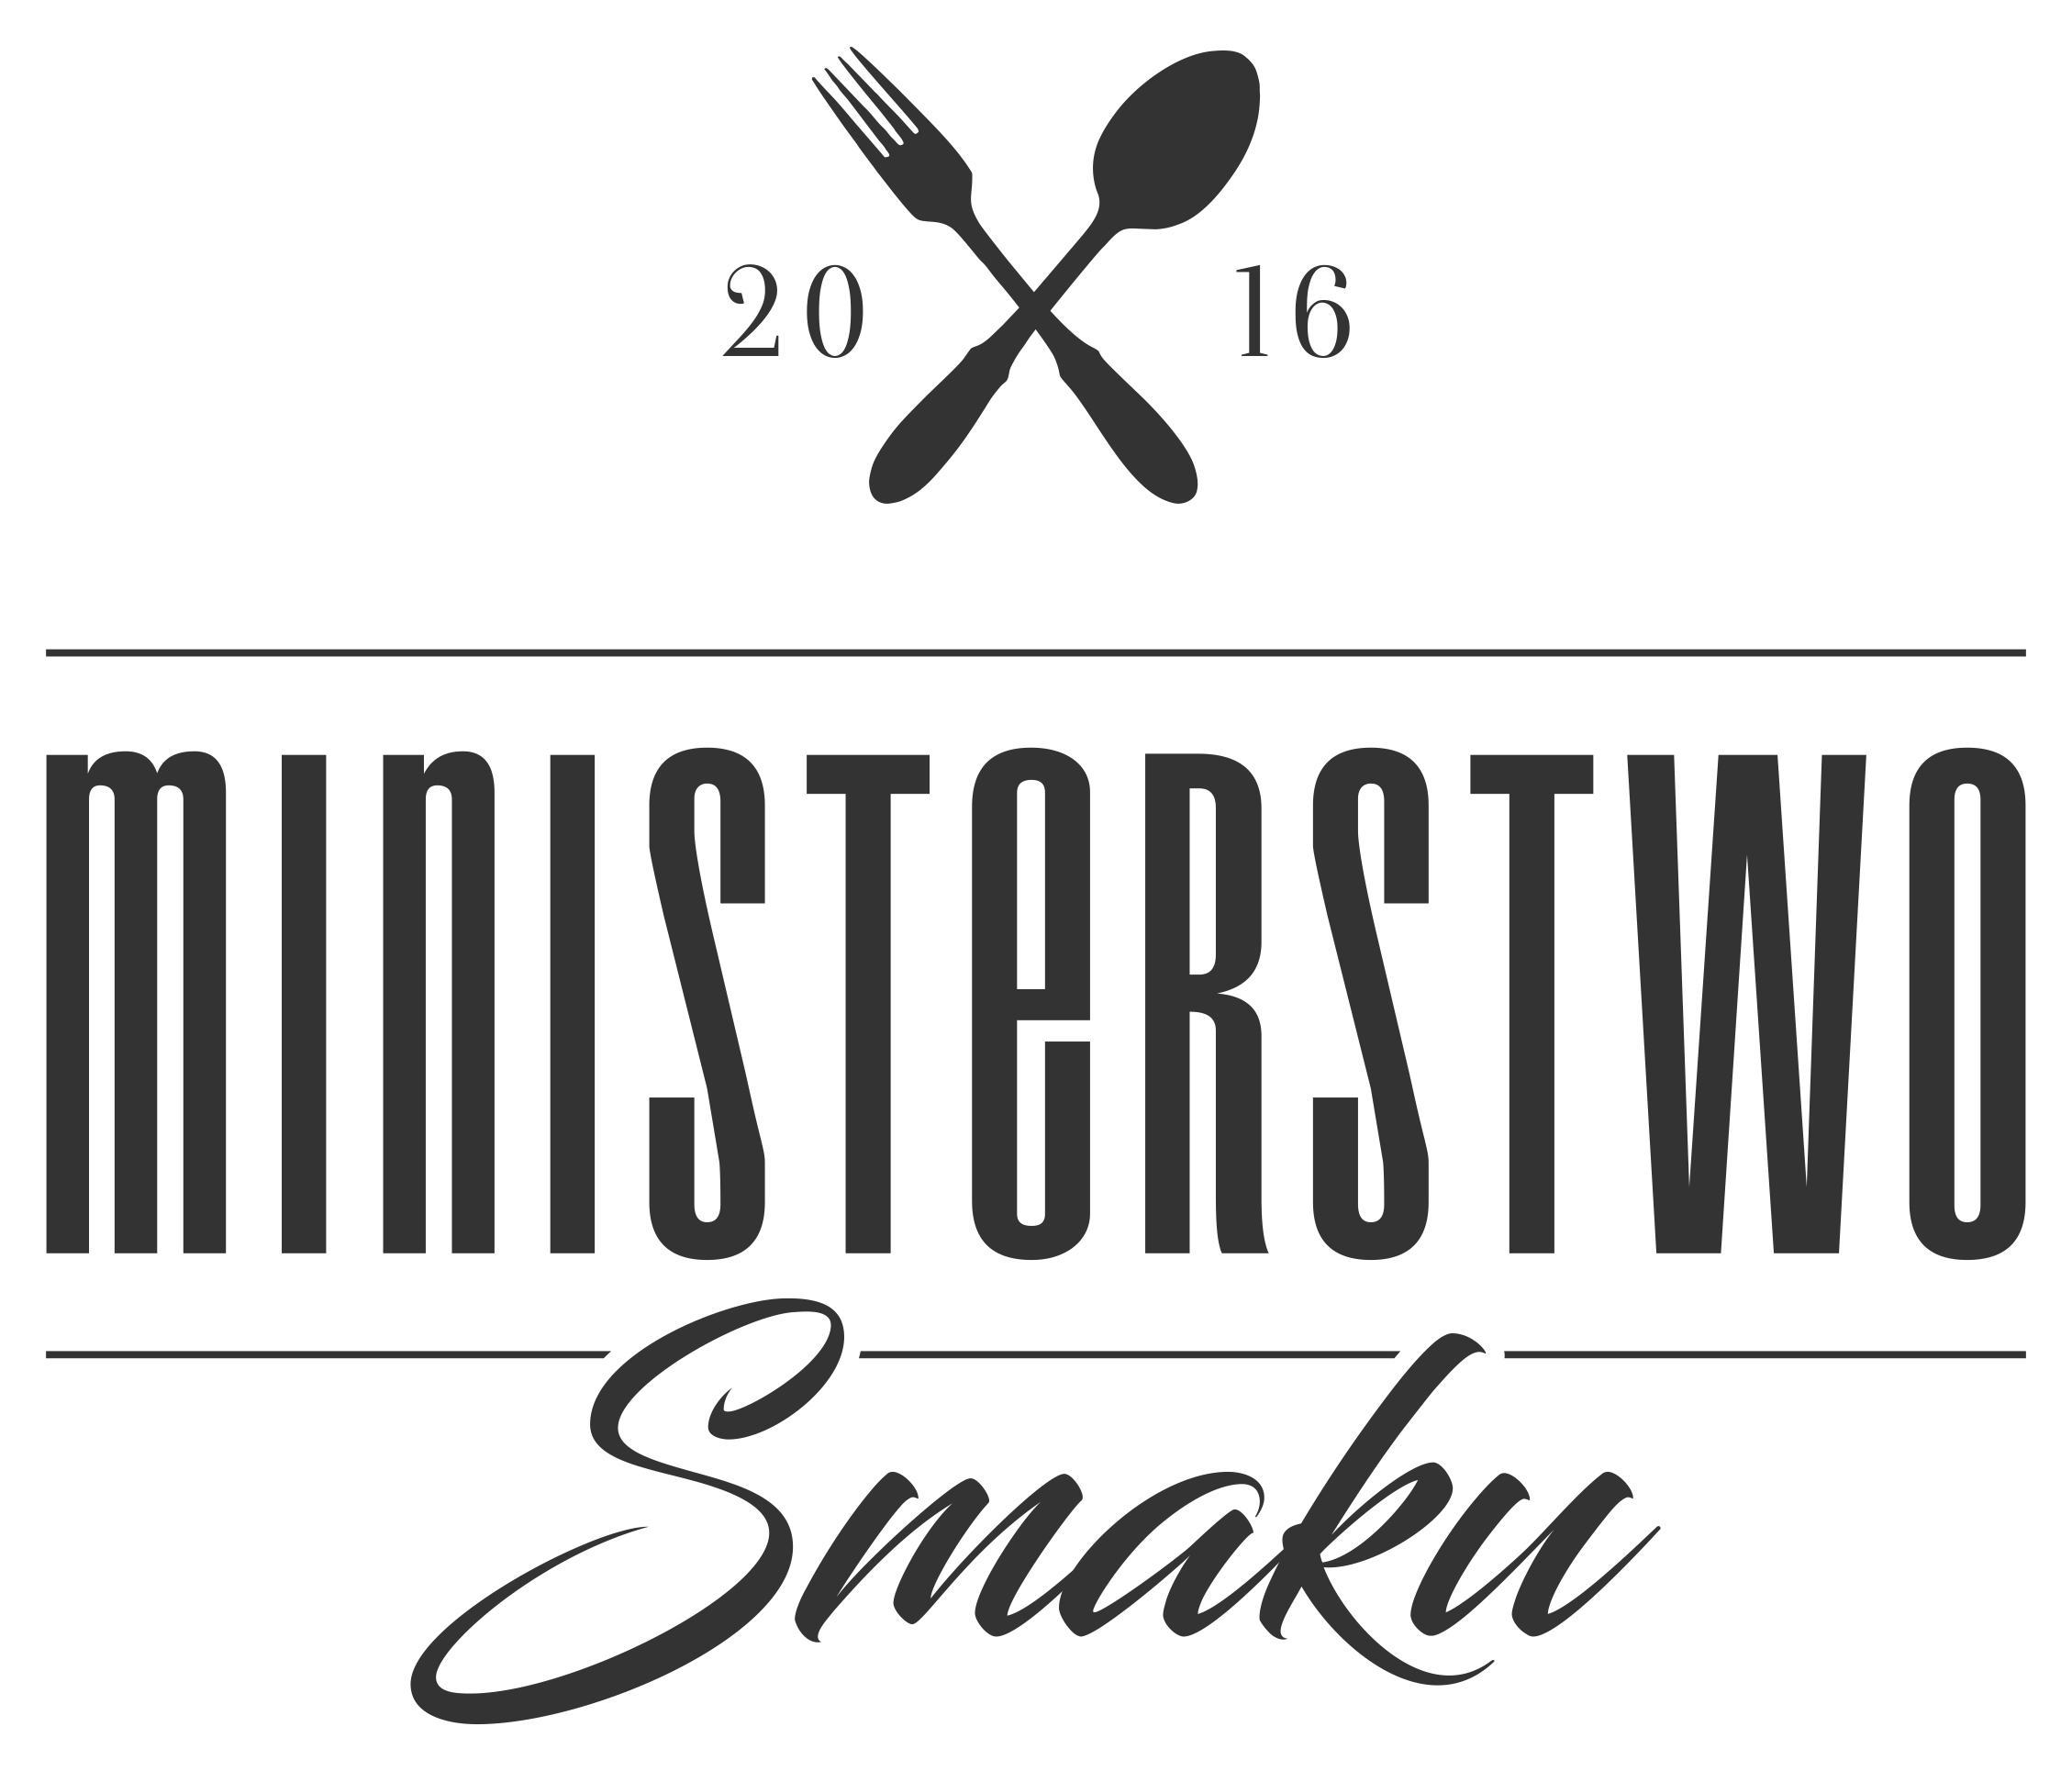 Ministerstwo smaku